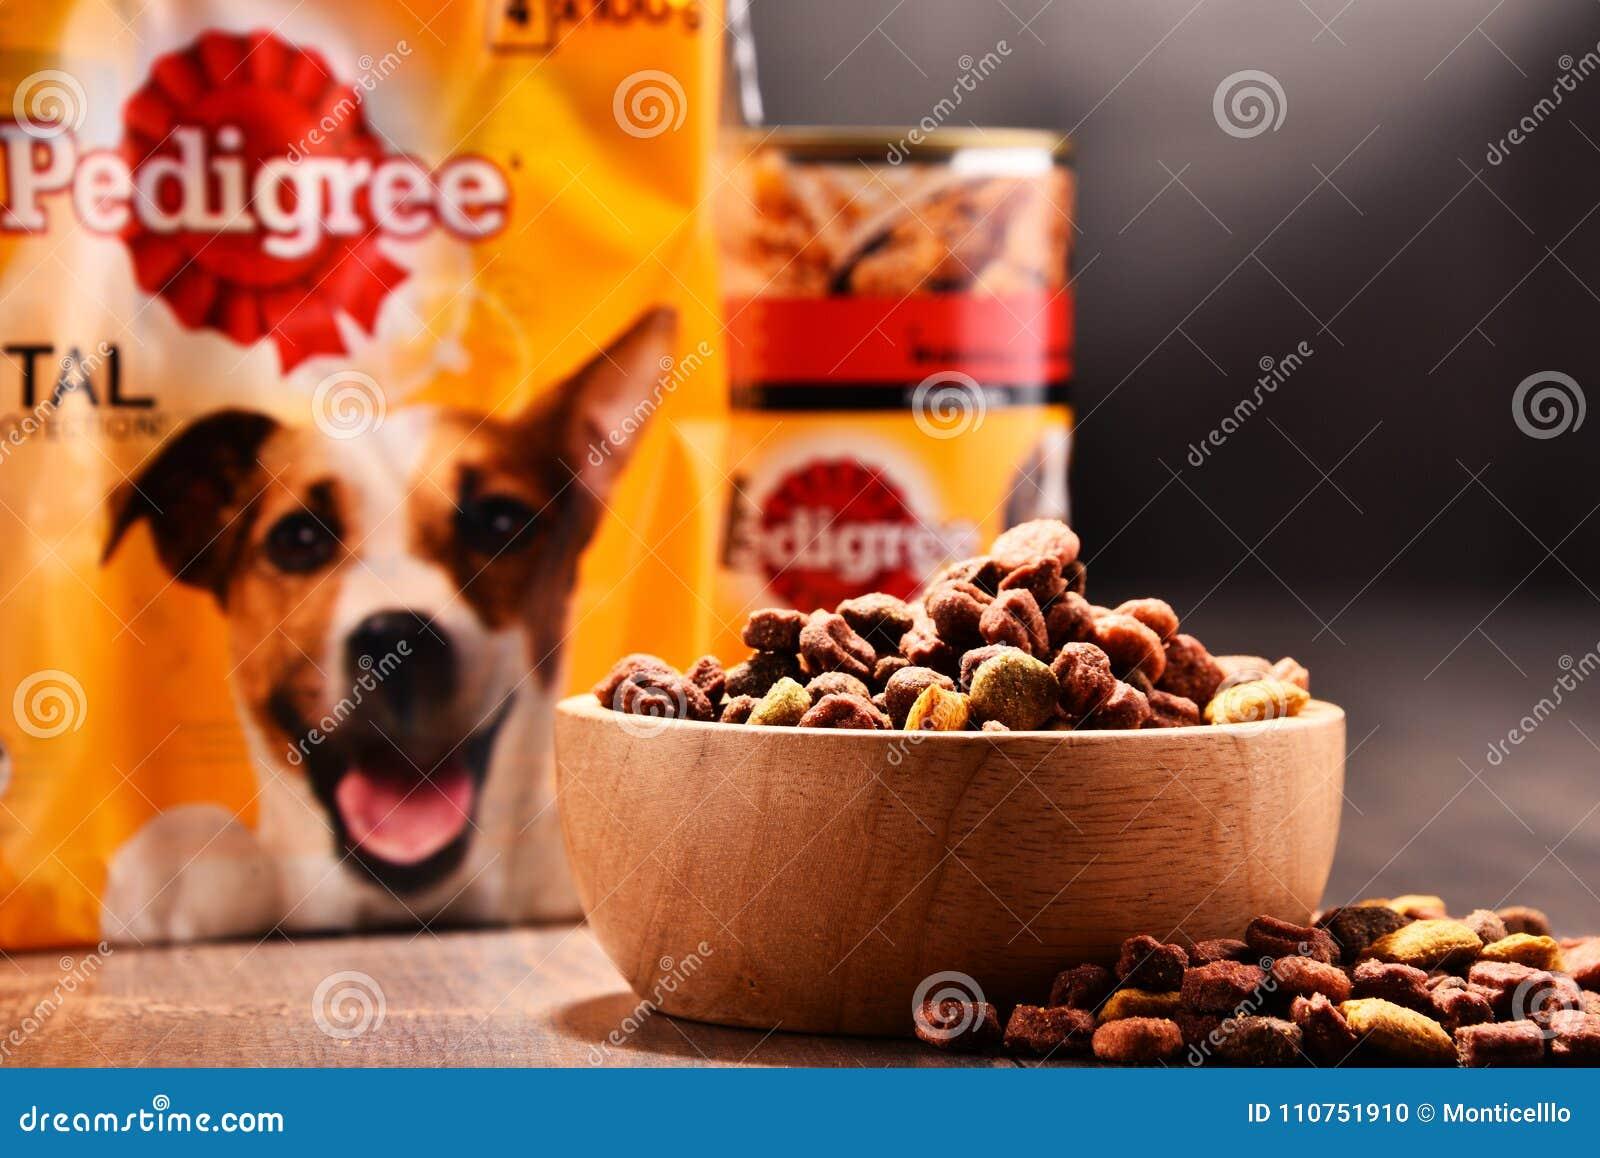 Can Of Pedigree Dog Food